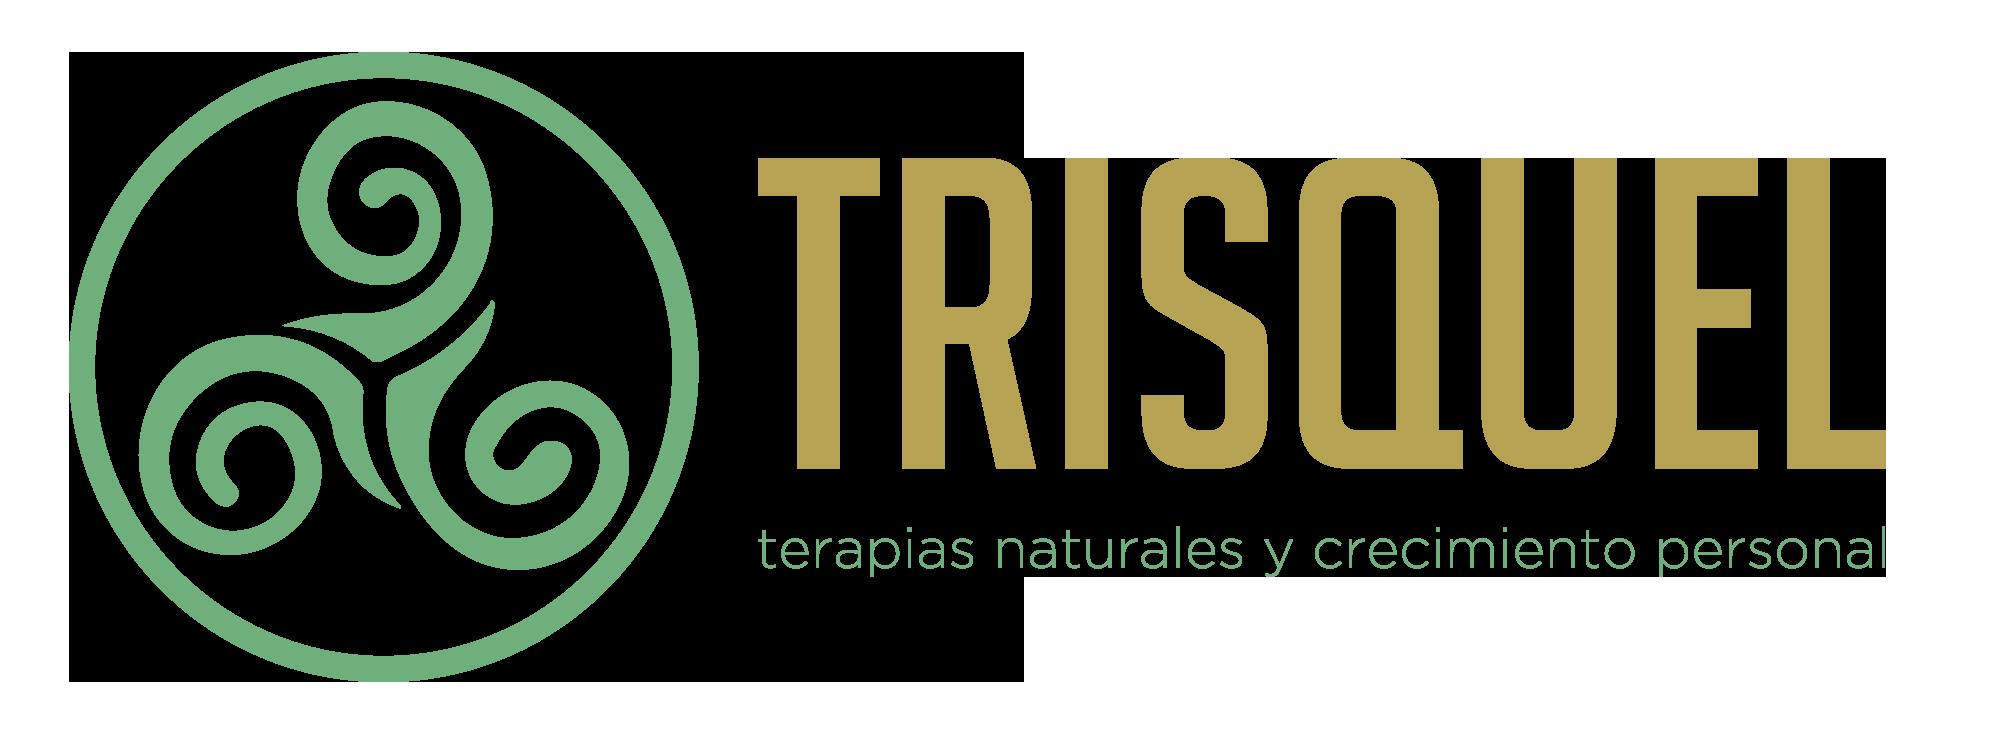 Terapias Trisquel Pontevedra